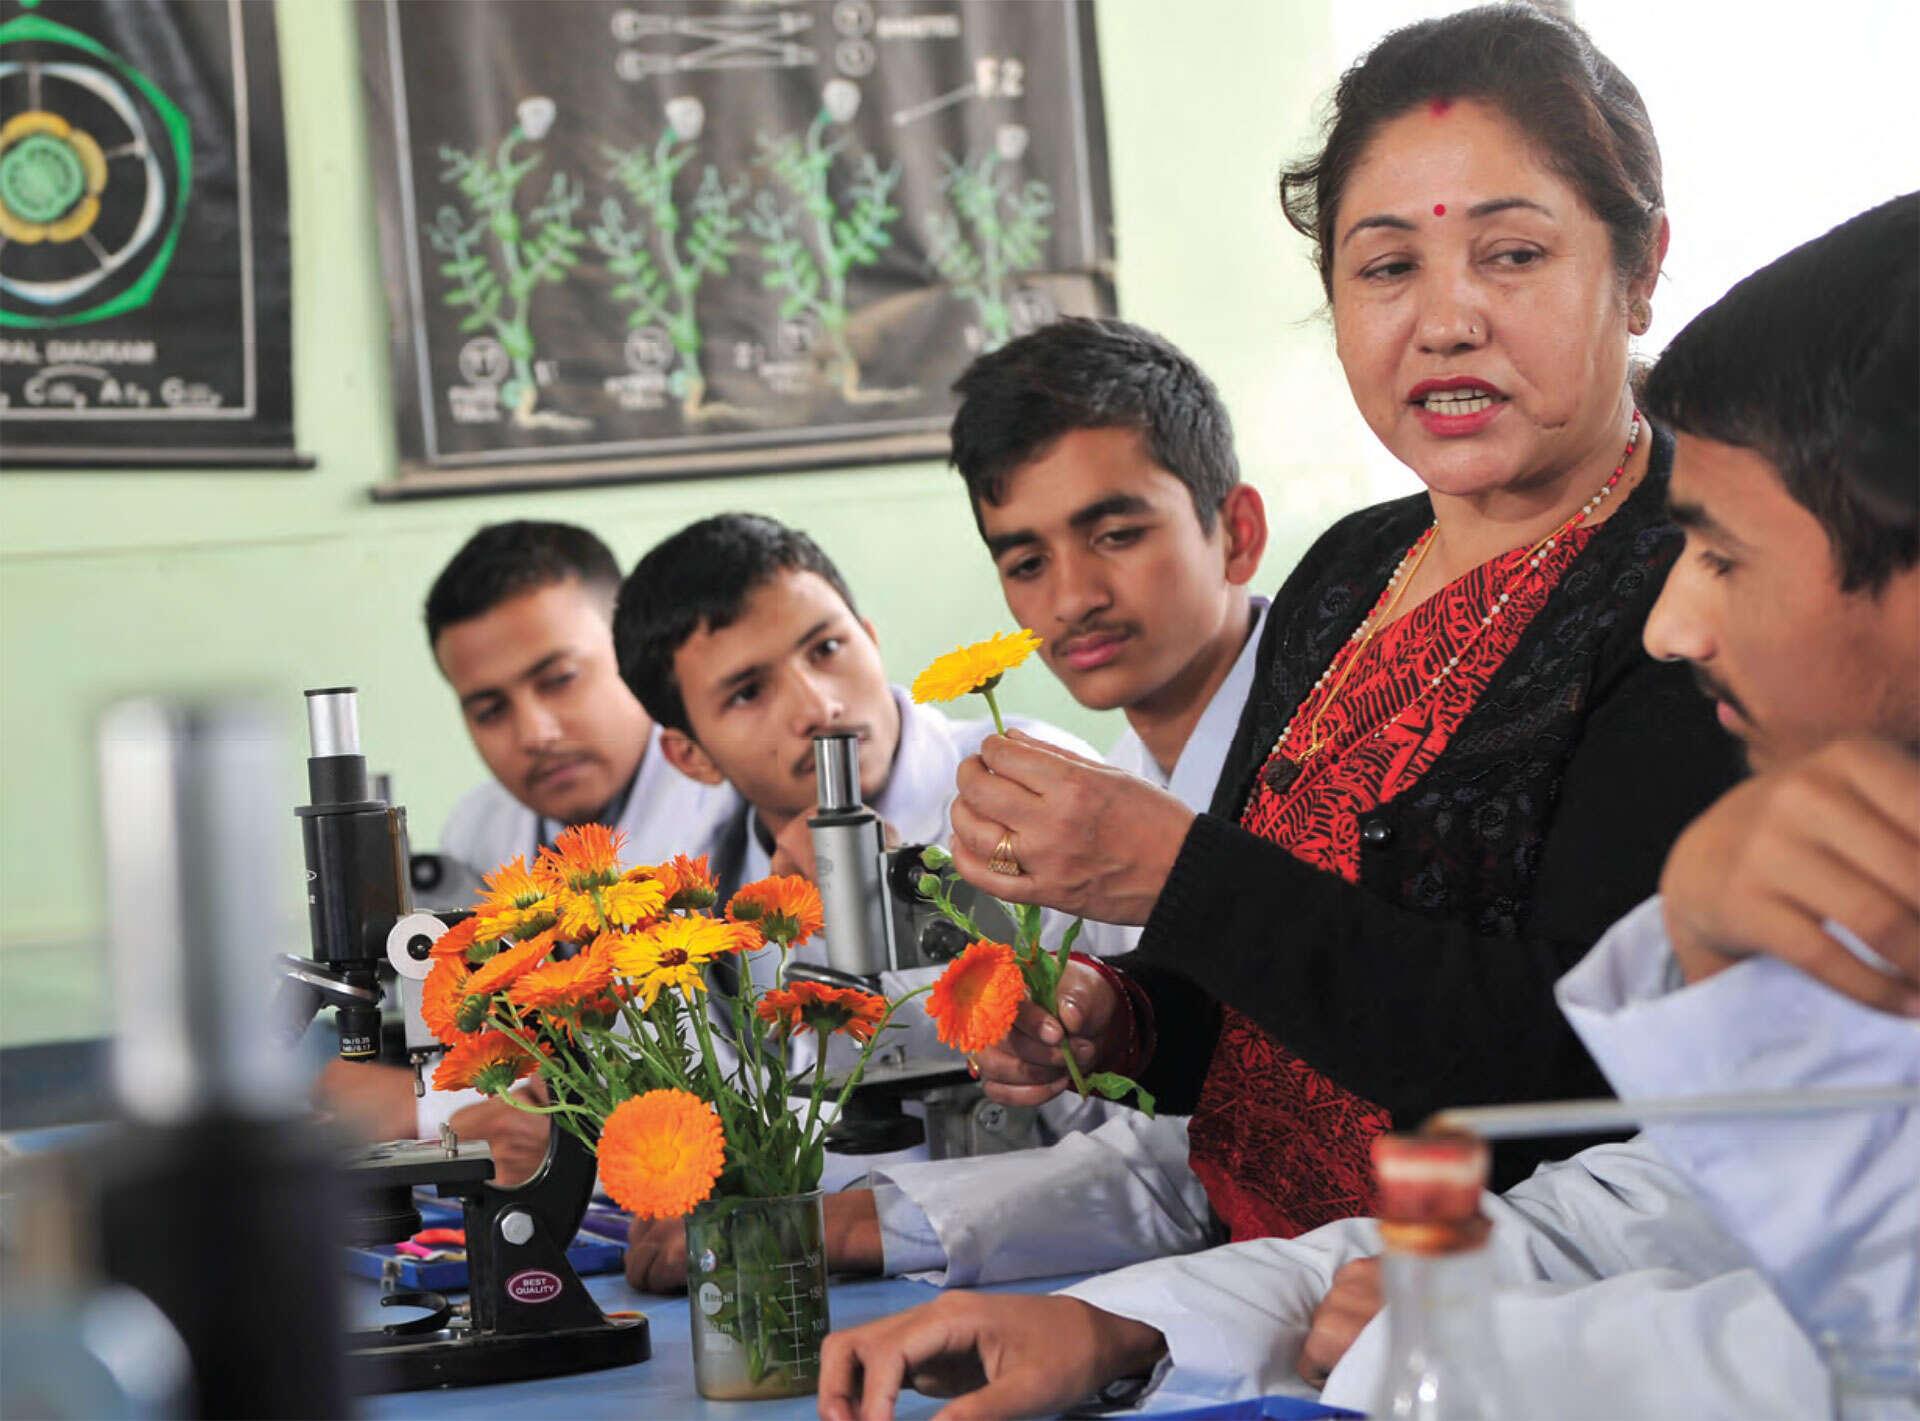 Kathmandu BernHardt School & College